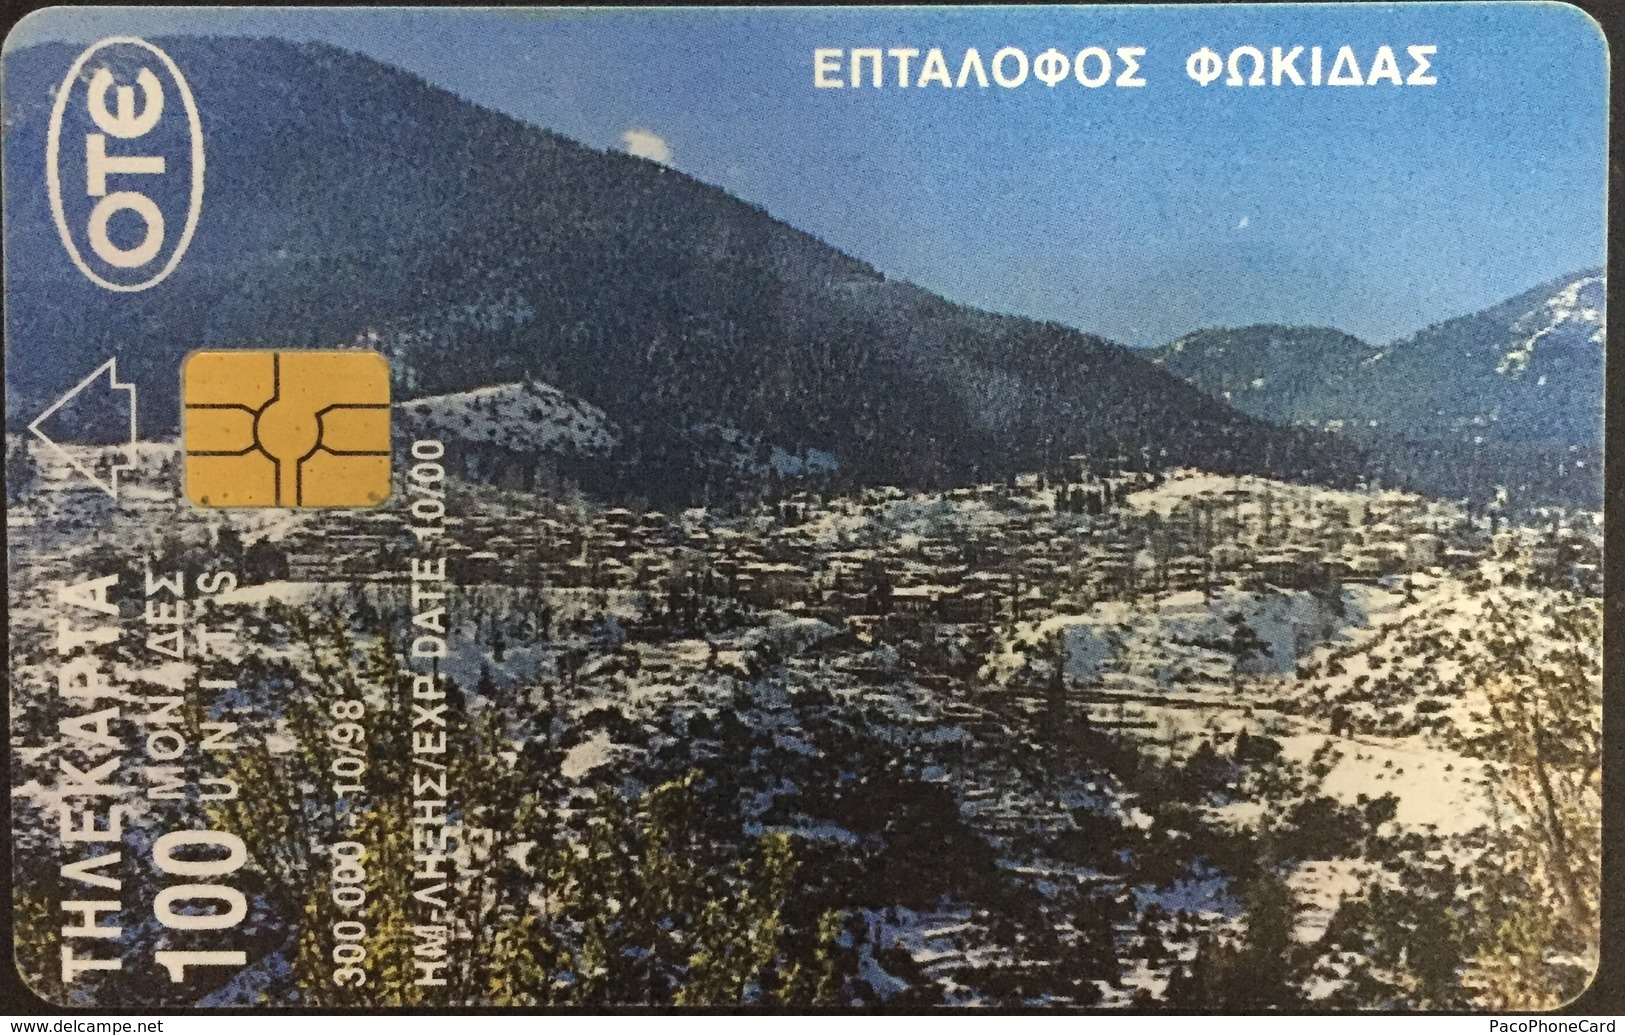 Paco \ GRECIA \ Chip OTE Χ0601 A1 \ Eptalofos Fokidas \ Usata - Greece